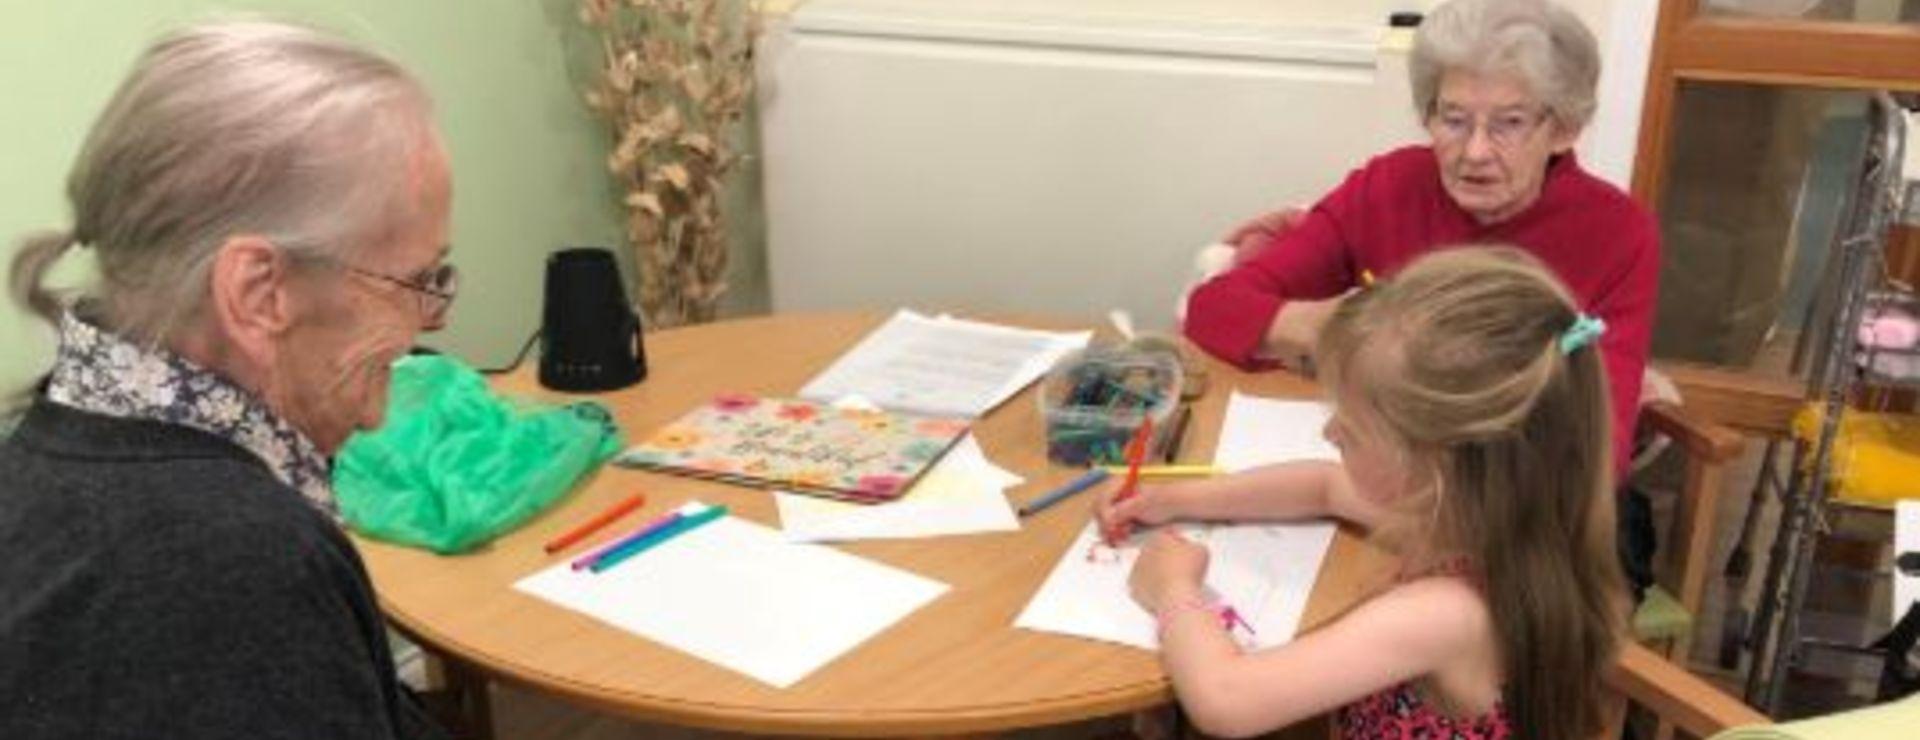 Emily showing off her art skills to Irene